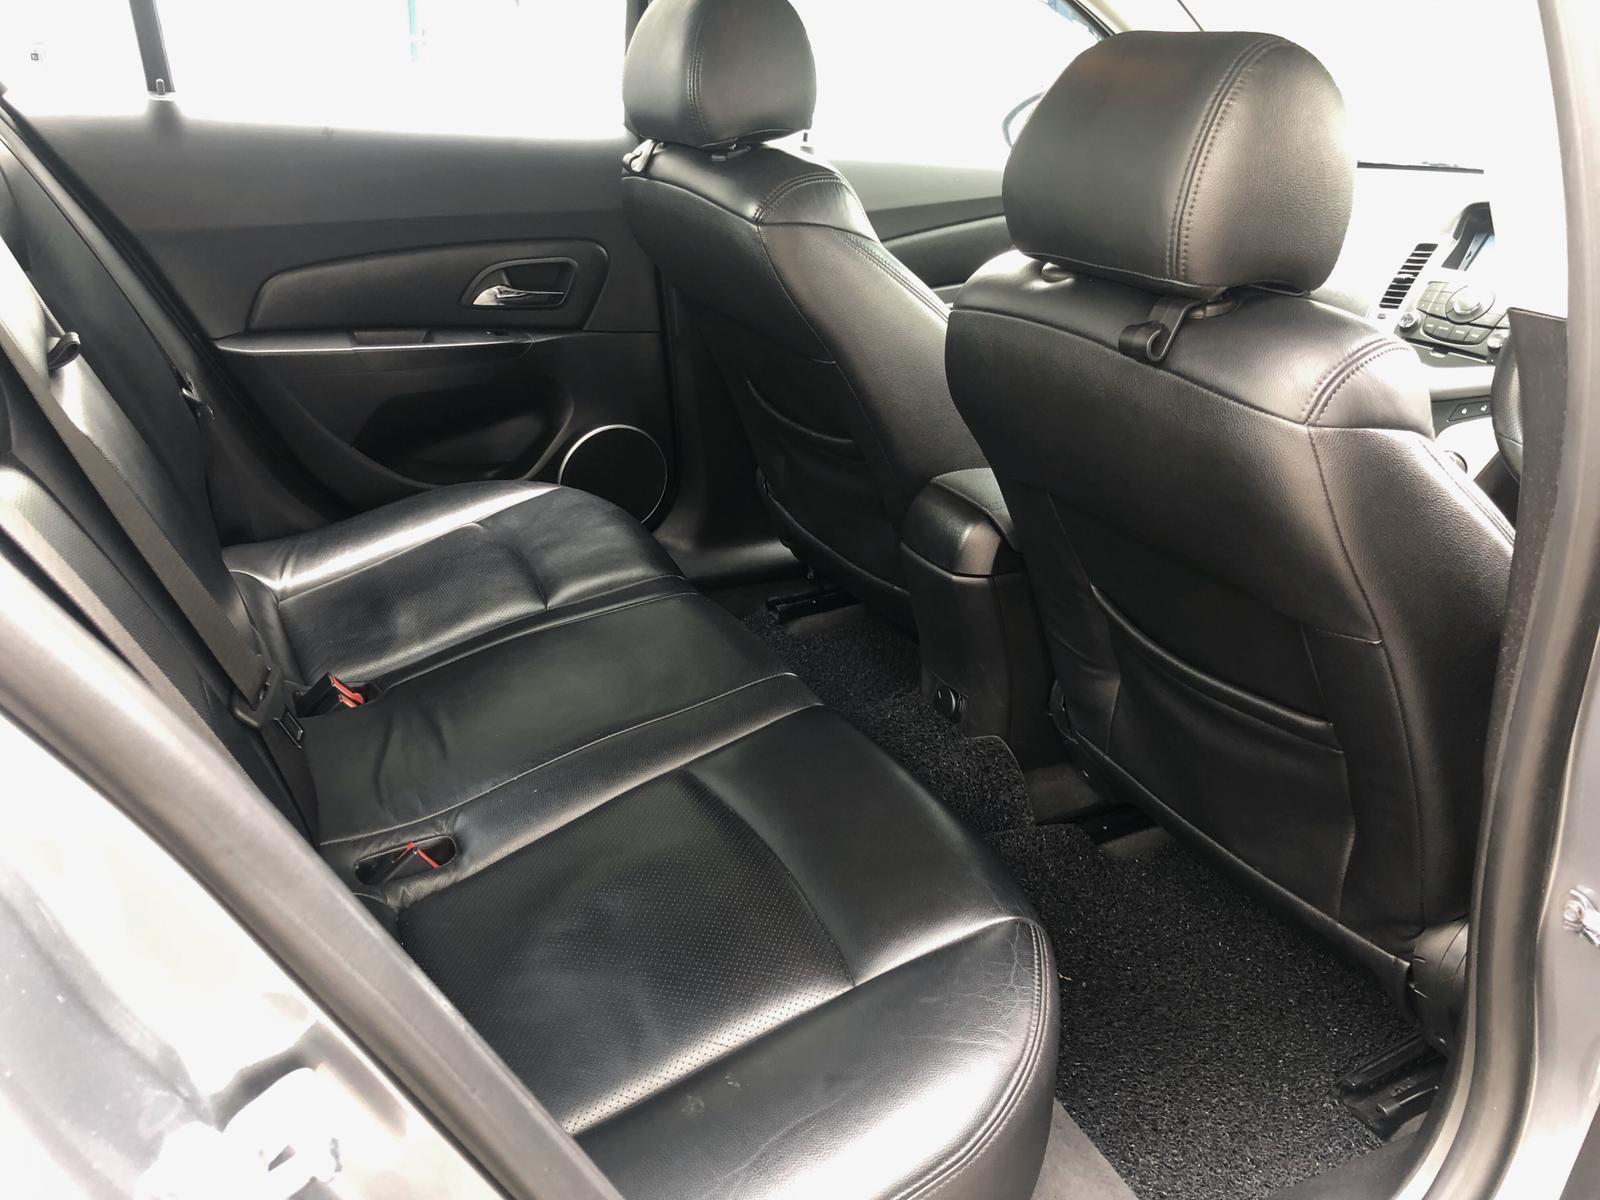 Chevrolet Cruze 1.6A *$210 after GoJek Rebate PHV Grab Ryde or Personal use